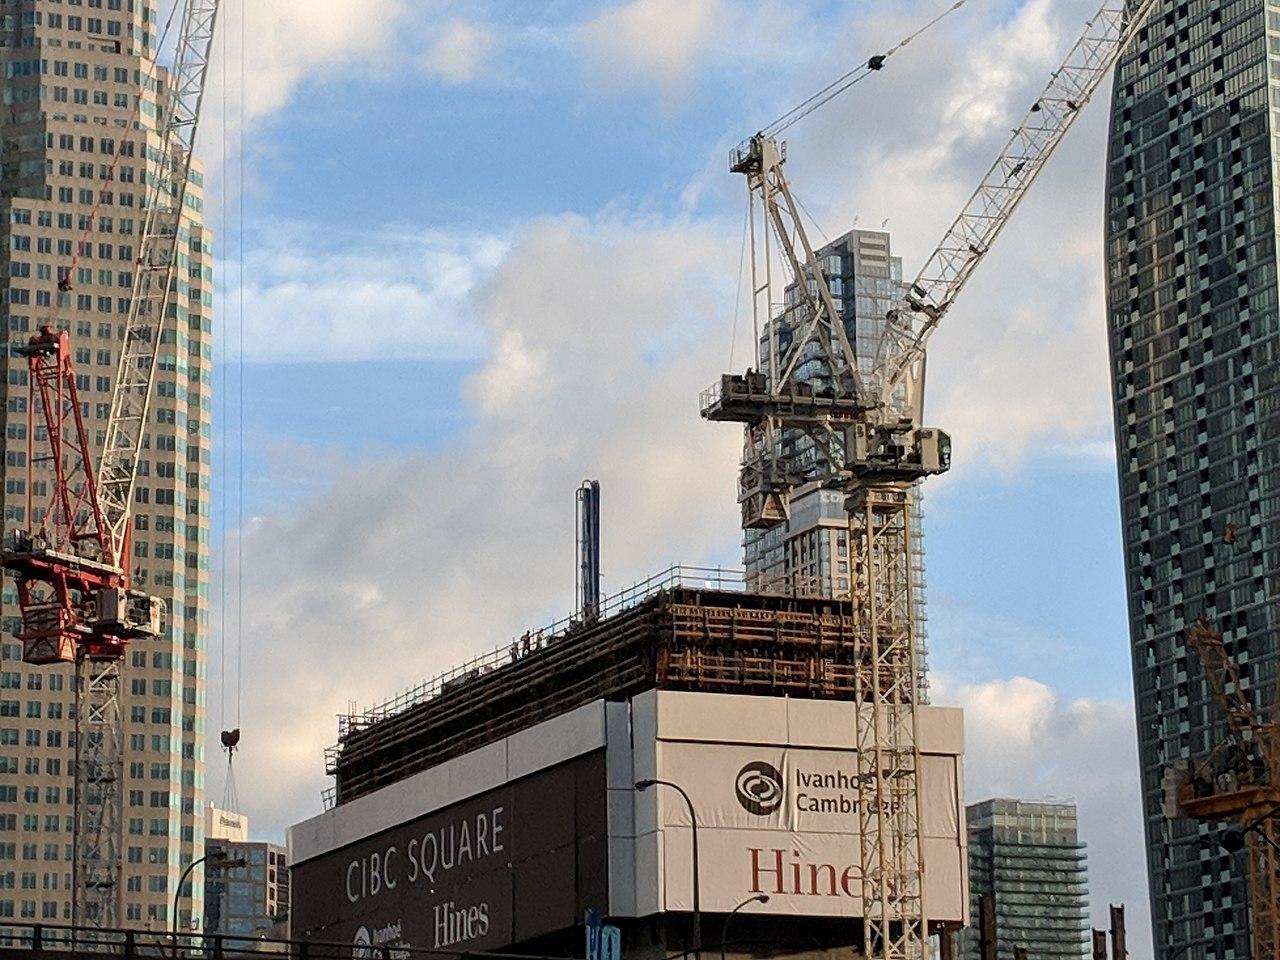 CIBC Square under construction with cranes.